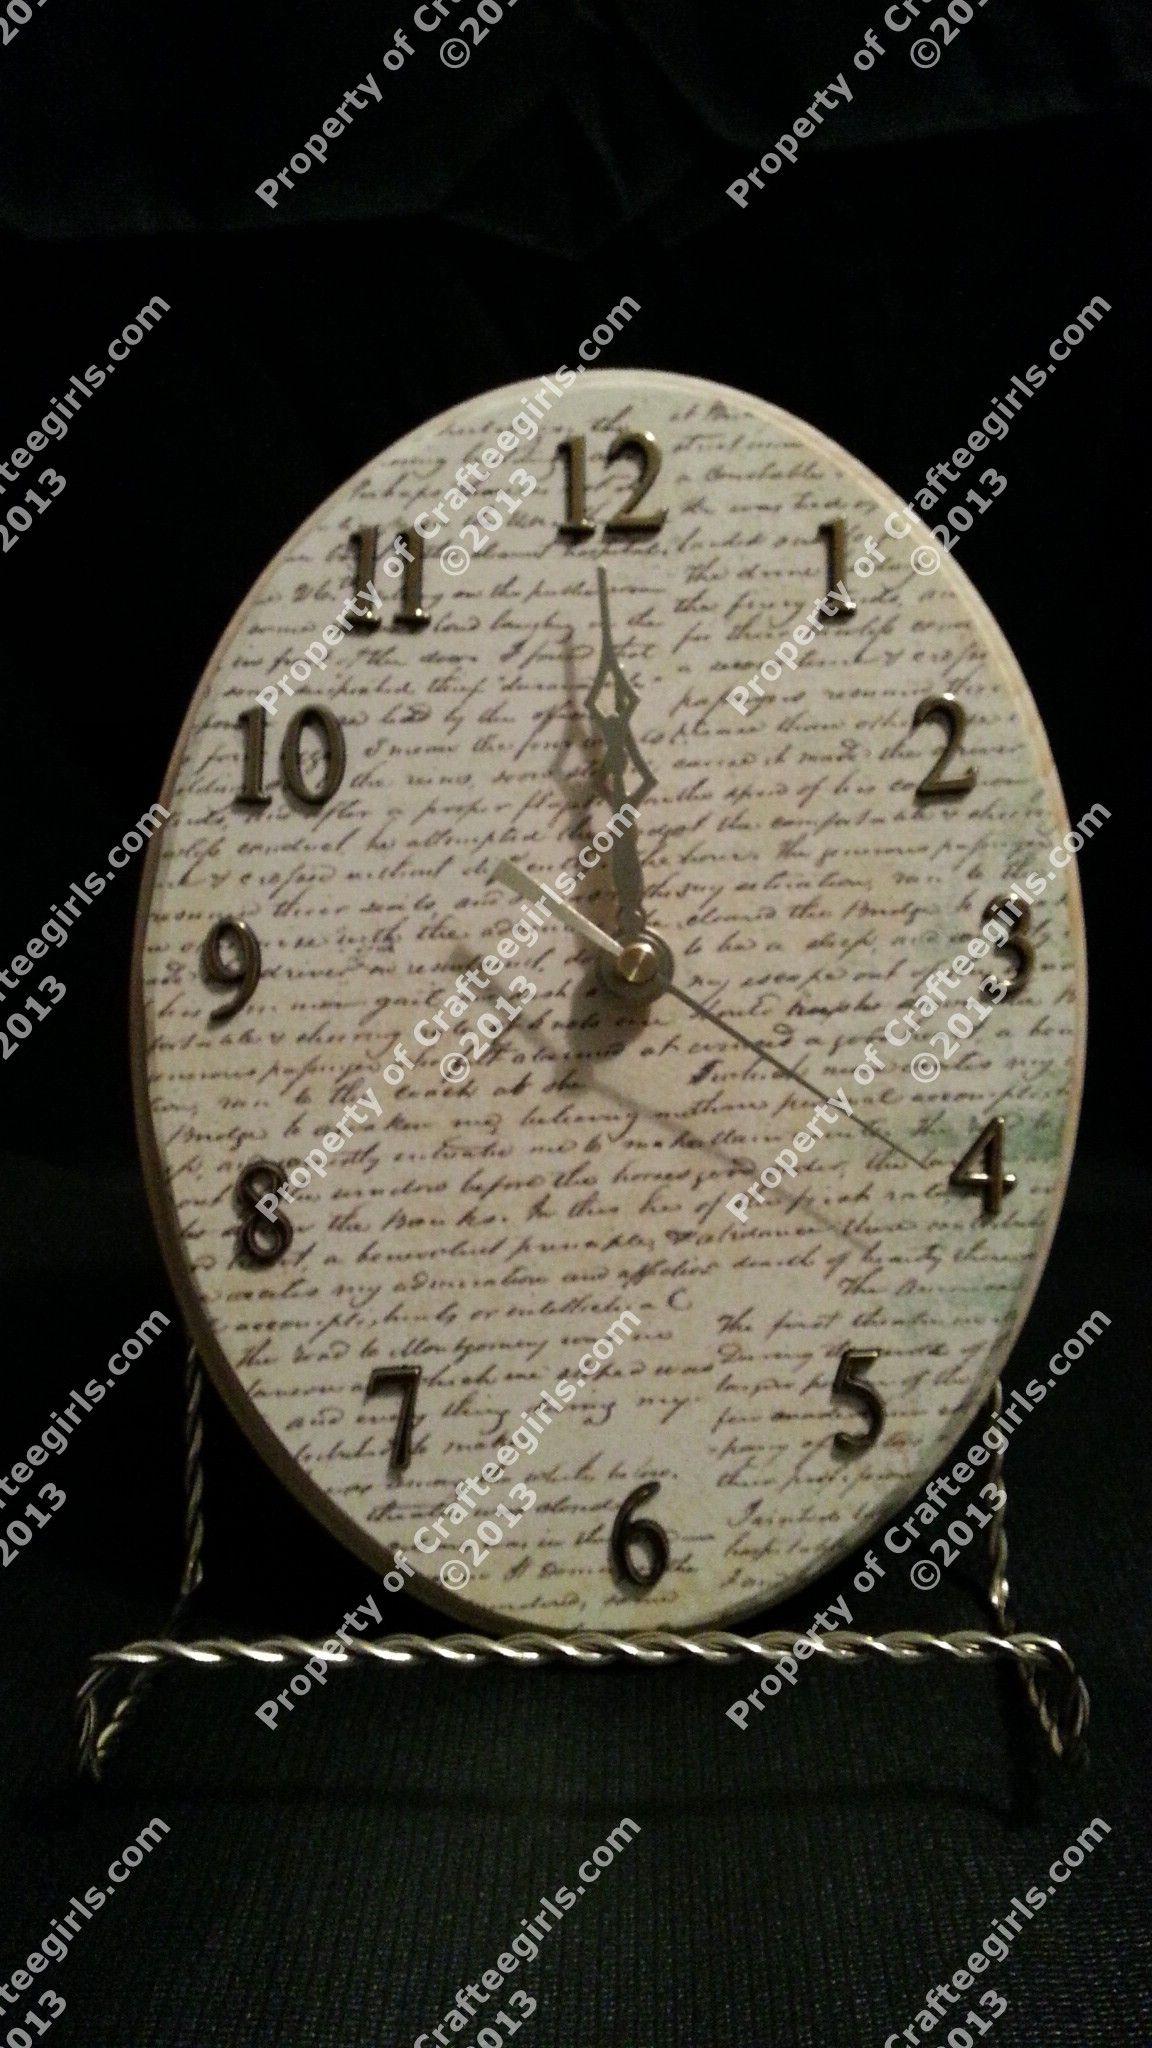 Handmade wooden Battery operated clock